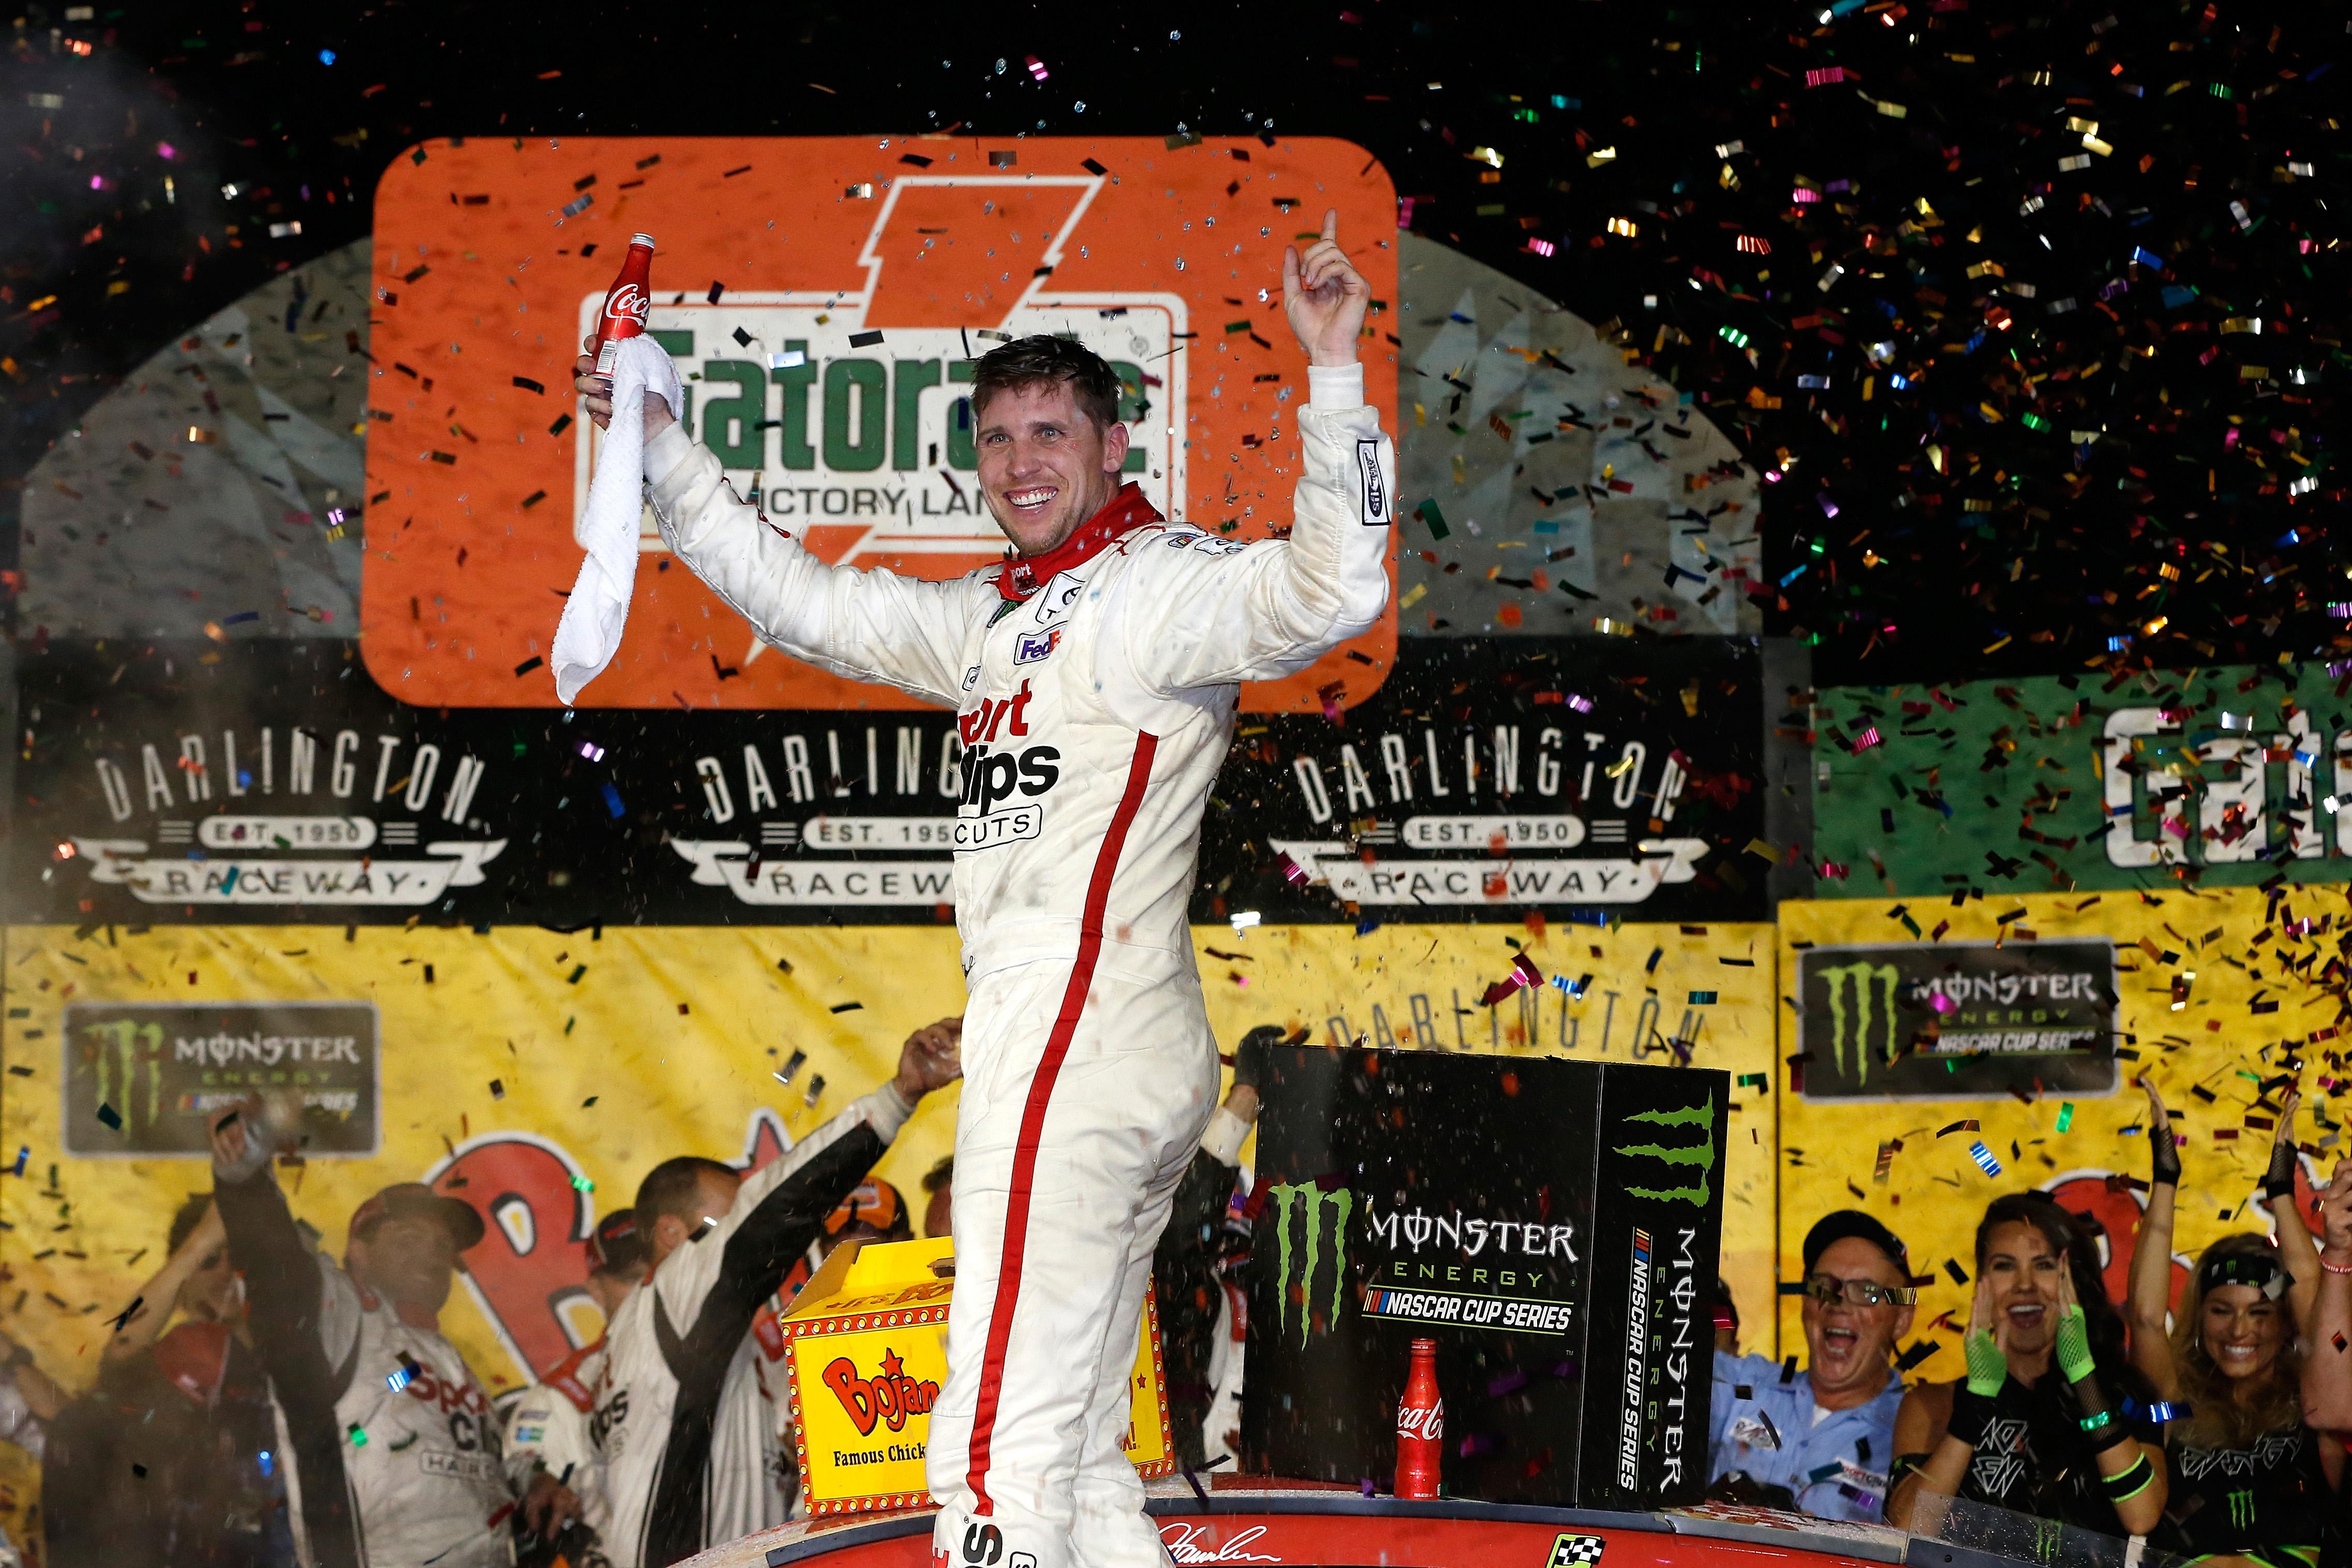 Denny Hamlin 2017 Darlington Raceway winner